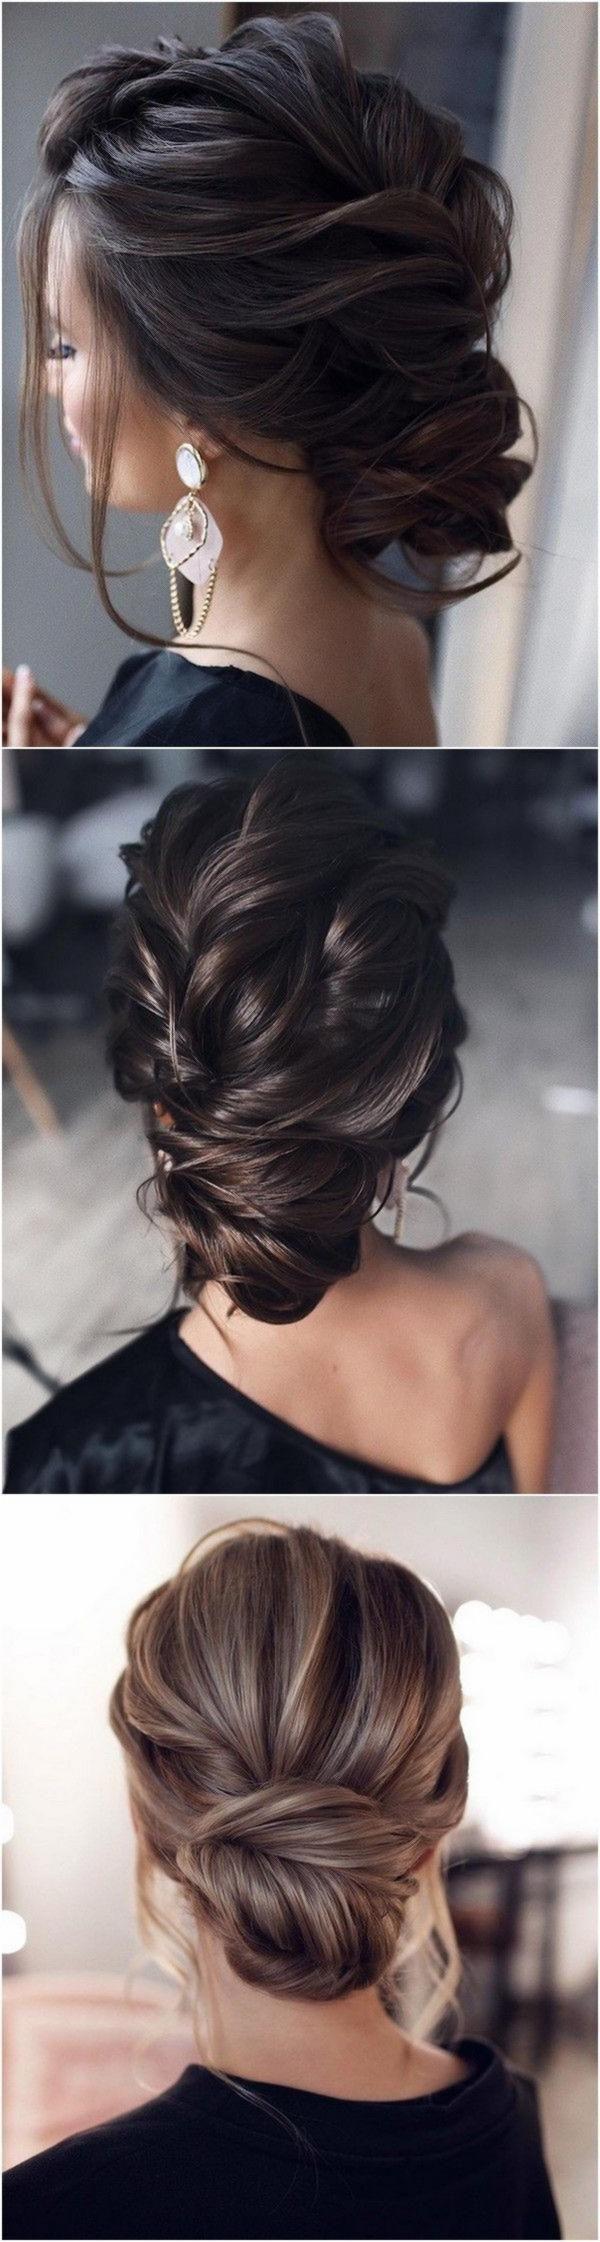 Neu Trend Frisuren 2019 Trending Updo Wedding Hairstyles For 2019 2 Feminine Fashion Source By Kristyl0ve Hair Styles Wedding Hairstyles Bridal Hair And Makeup